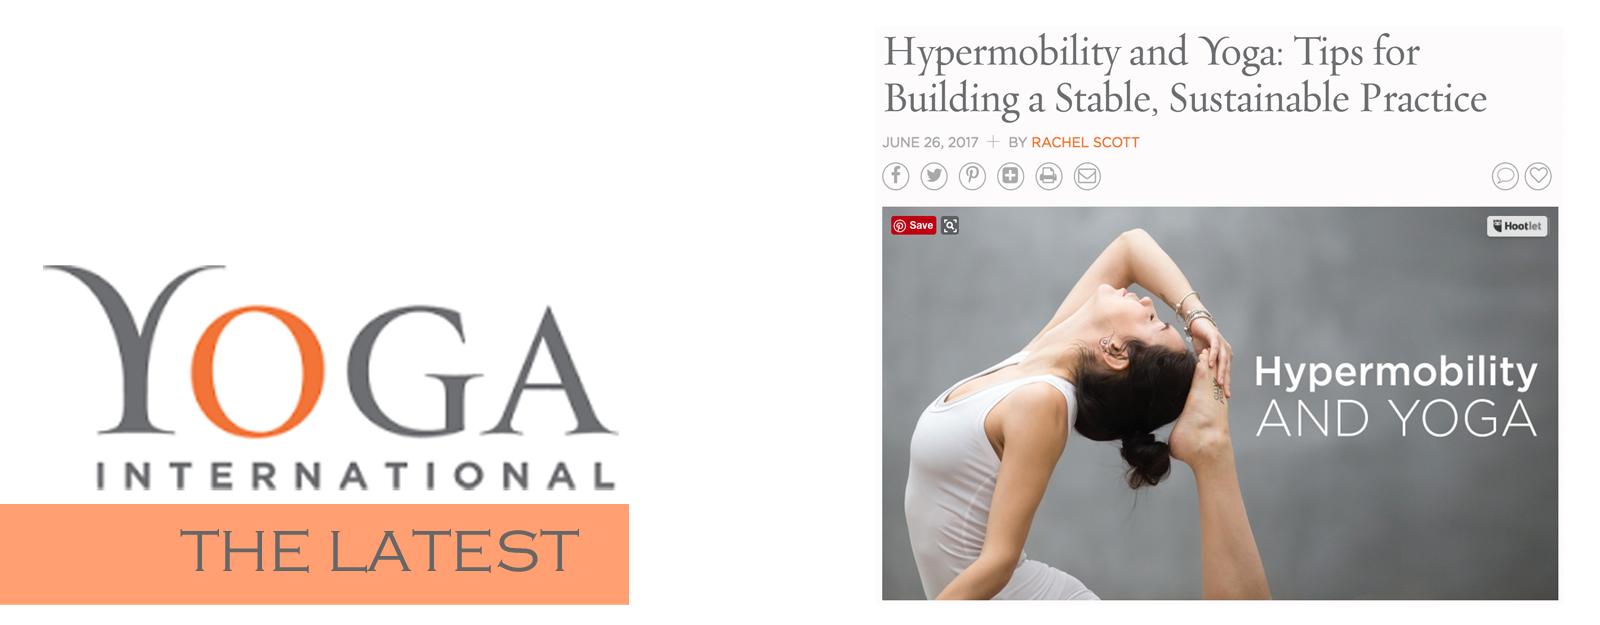 yi-hypermoblility